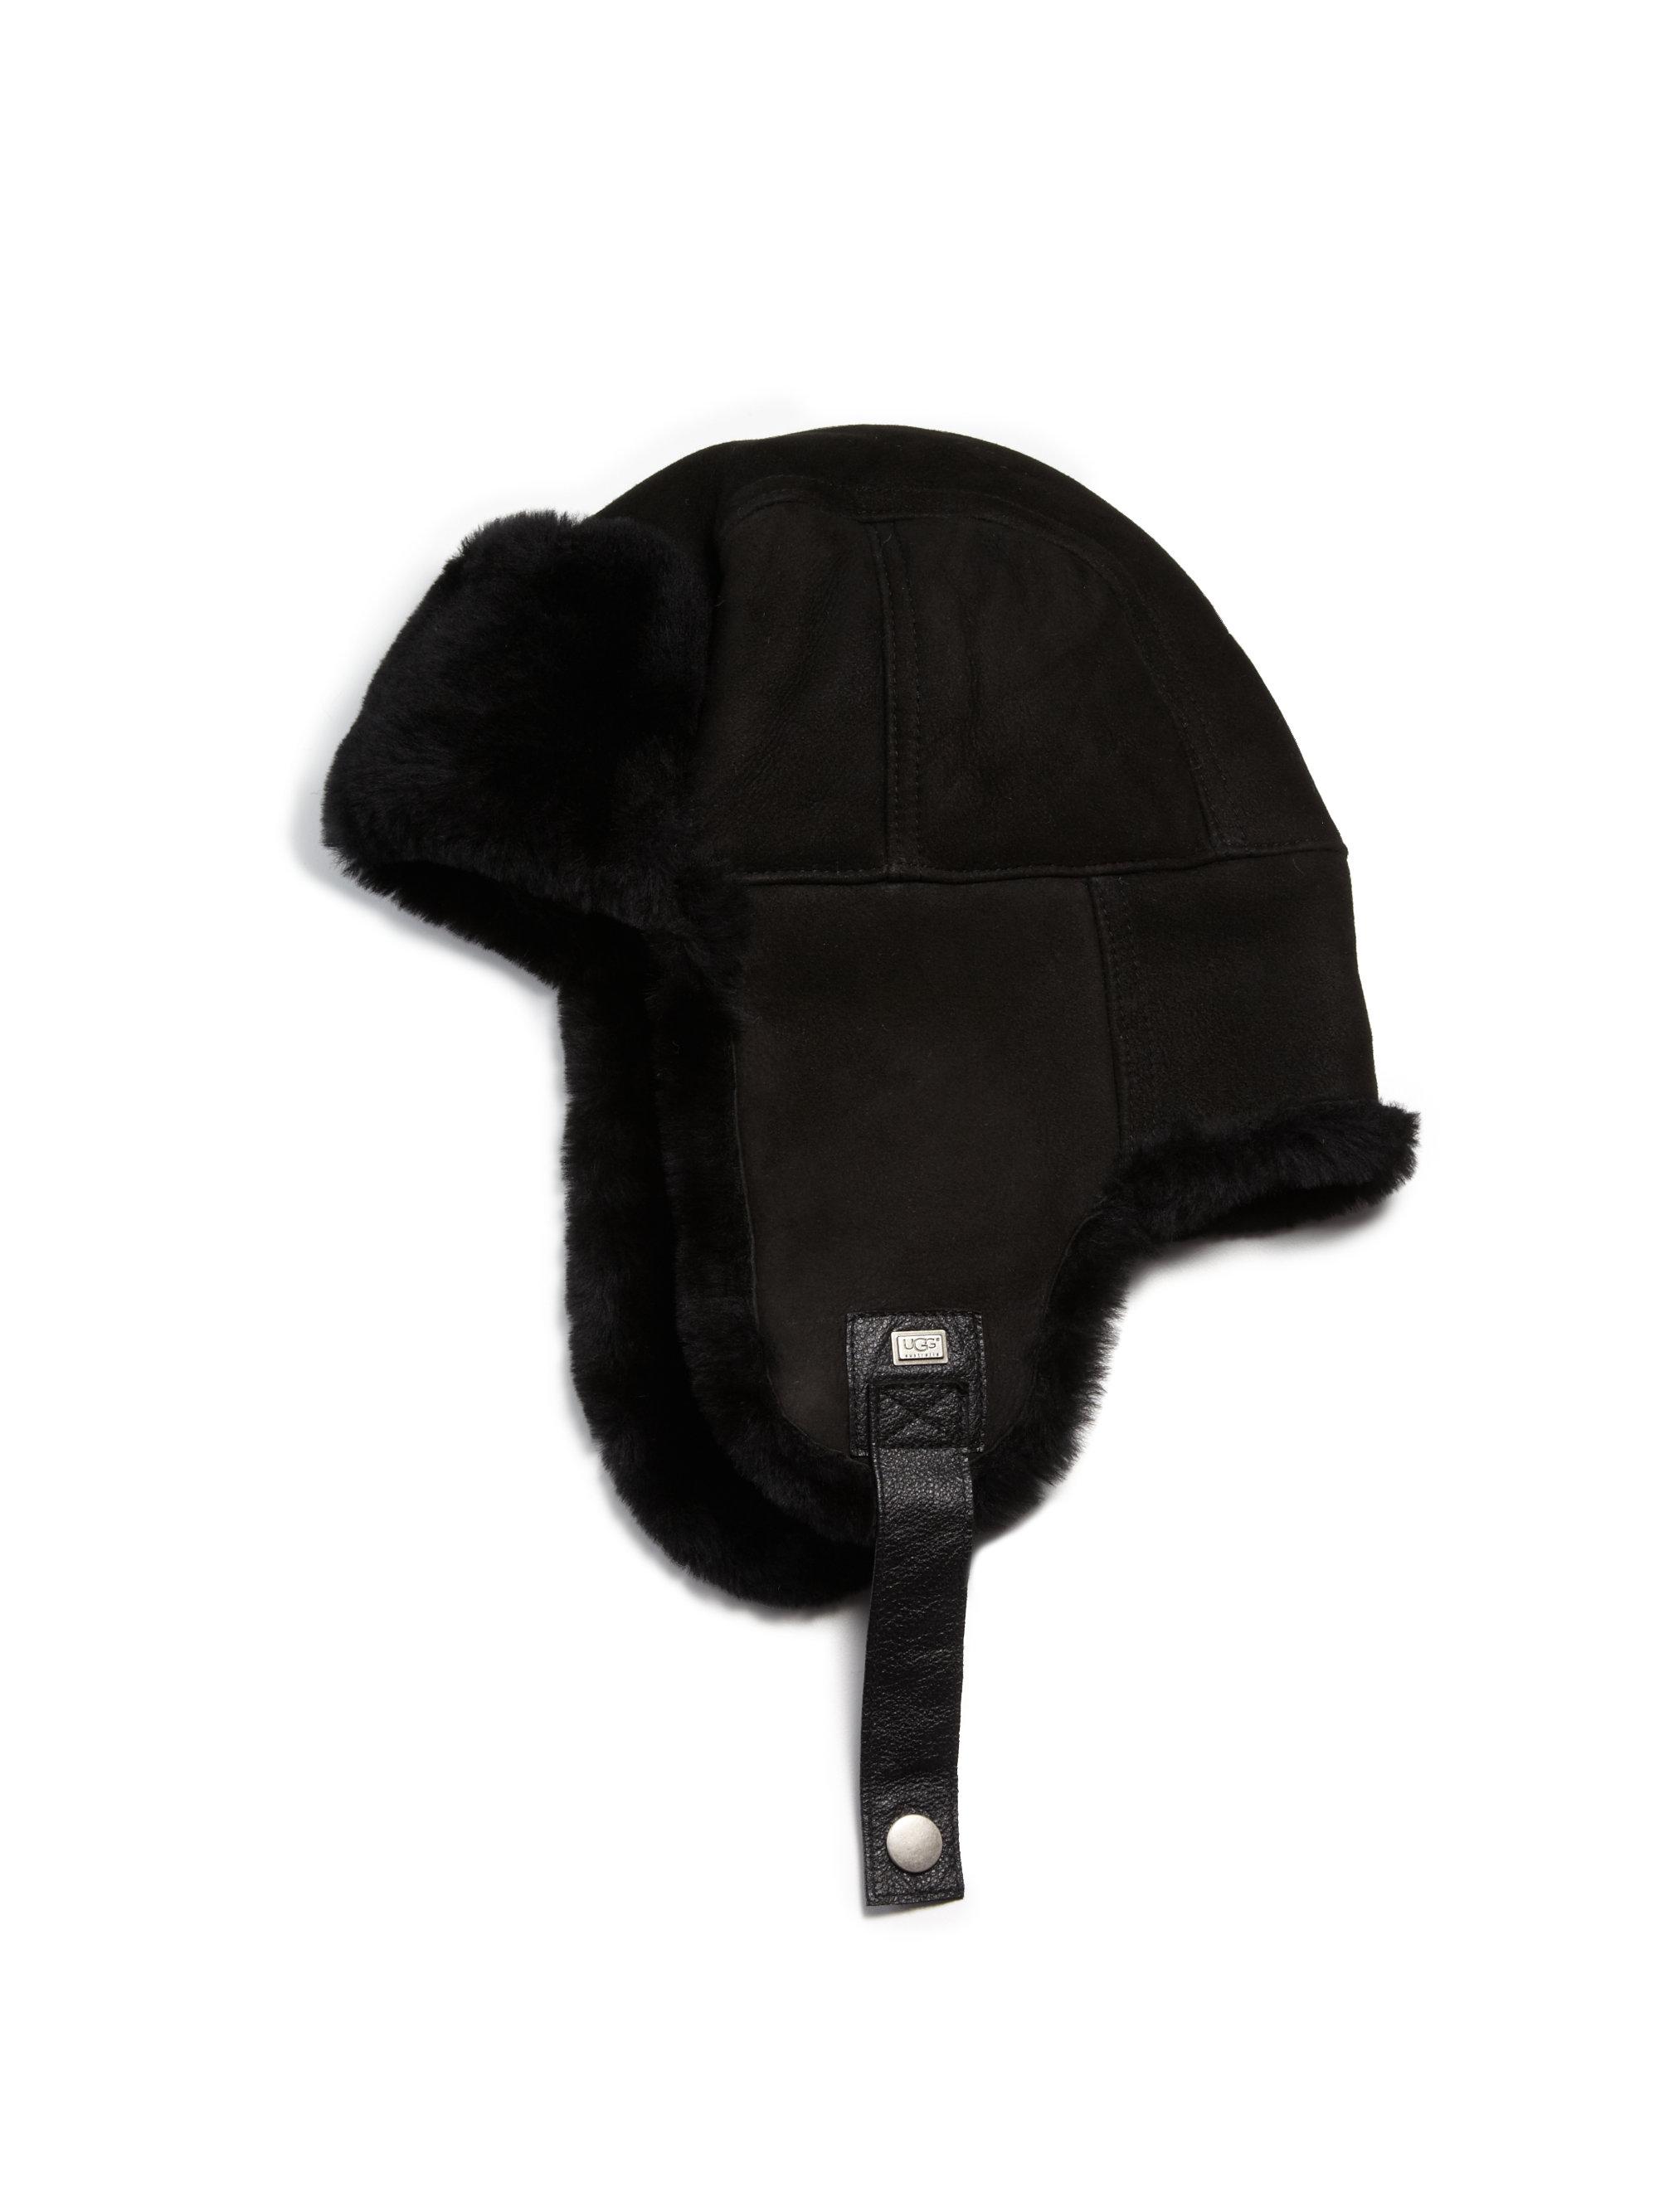 8d18fe7d4d71 Ugg Trapper Hat Uk